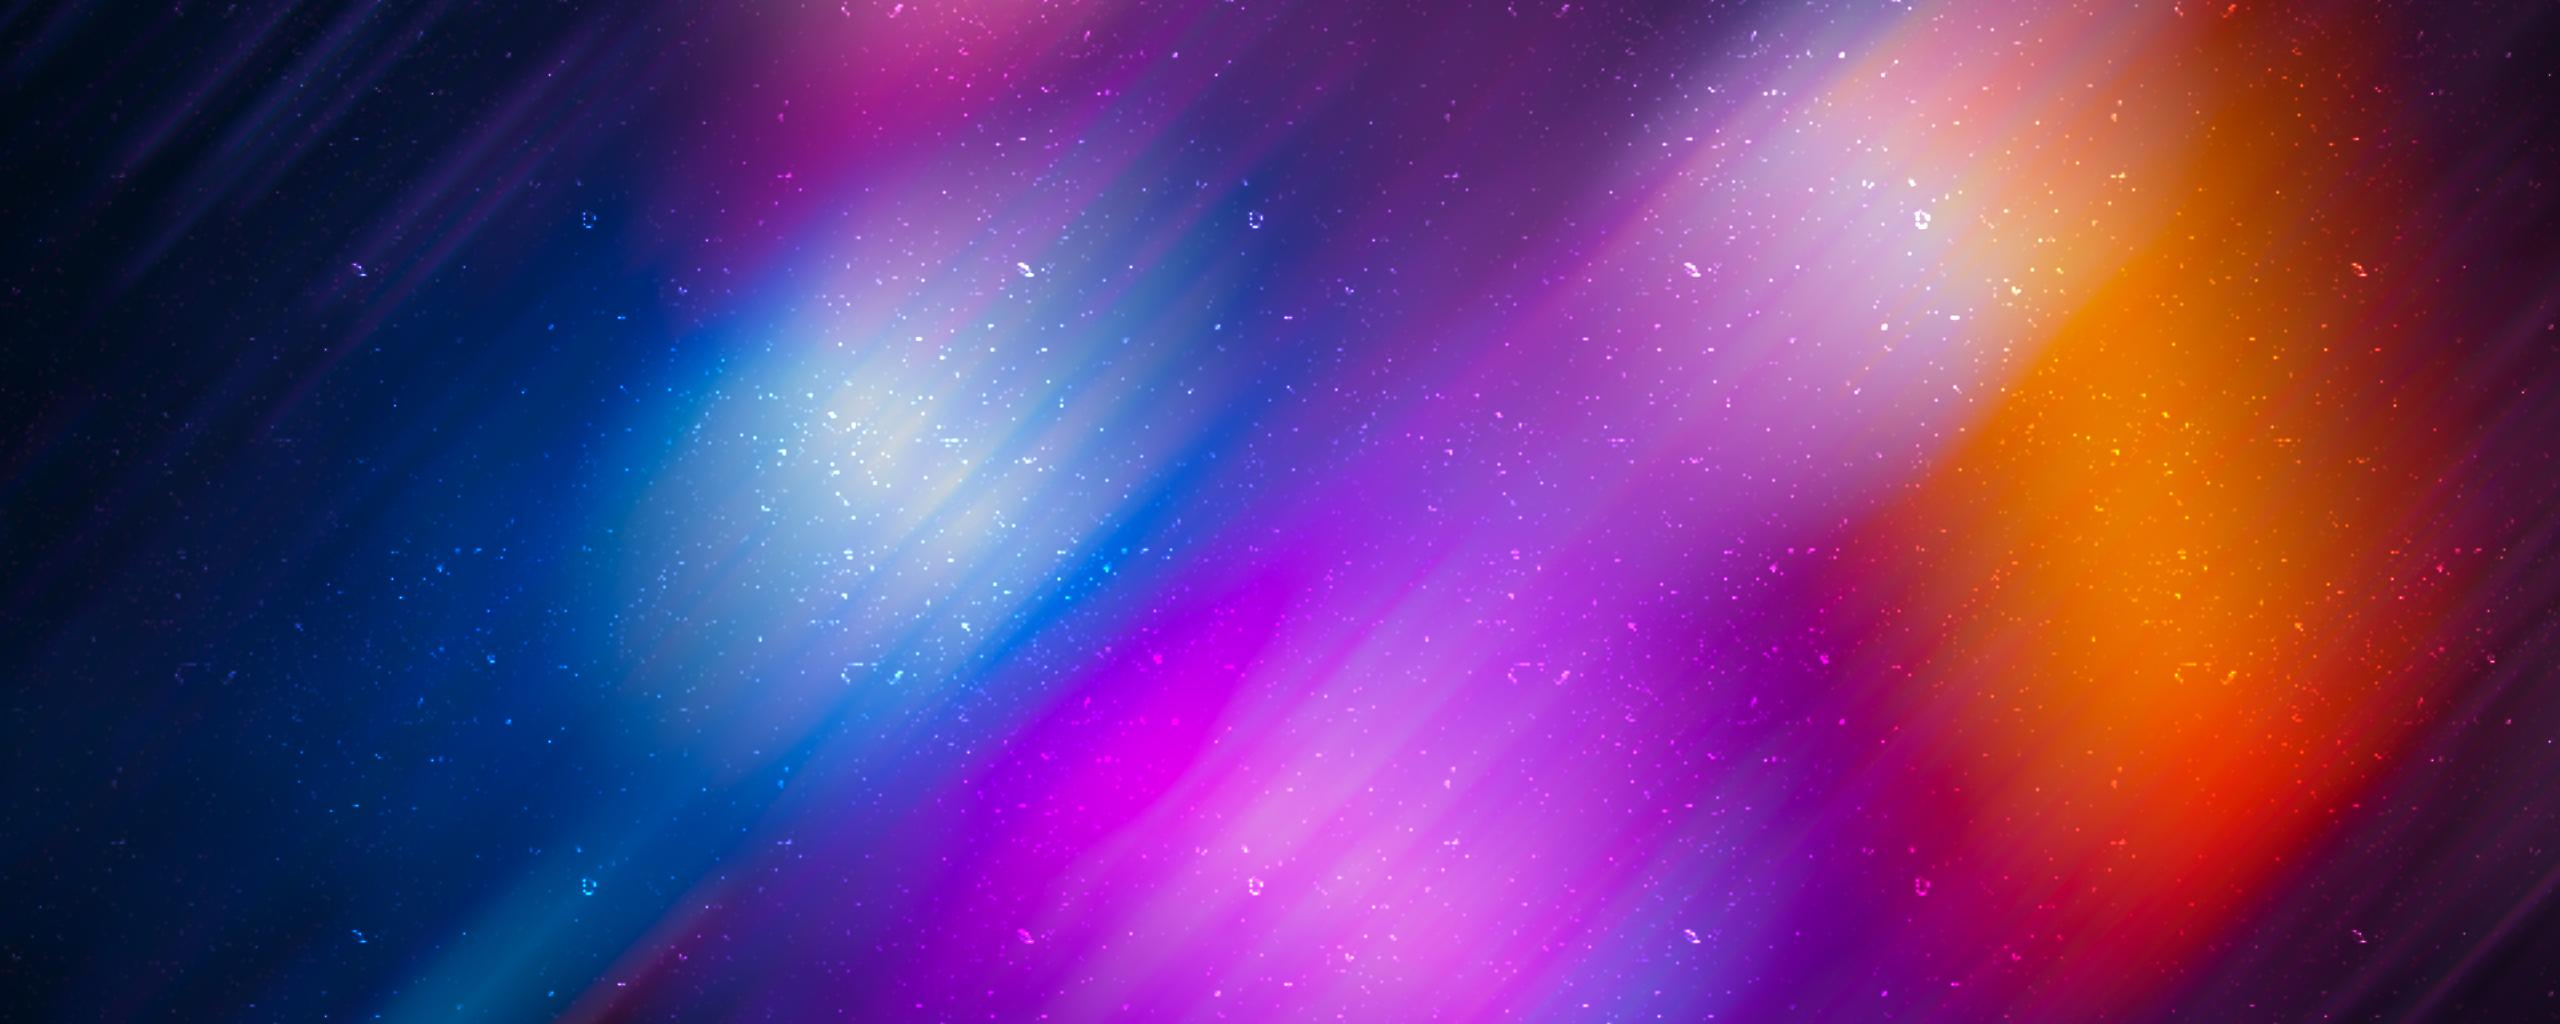 motion-lights-abstract-4k-m5.jpg